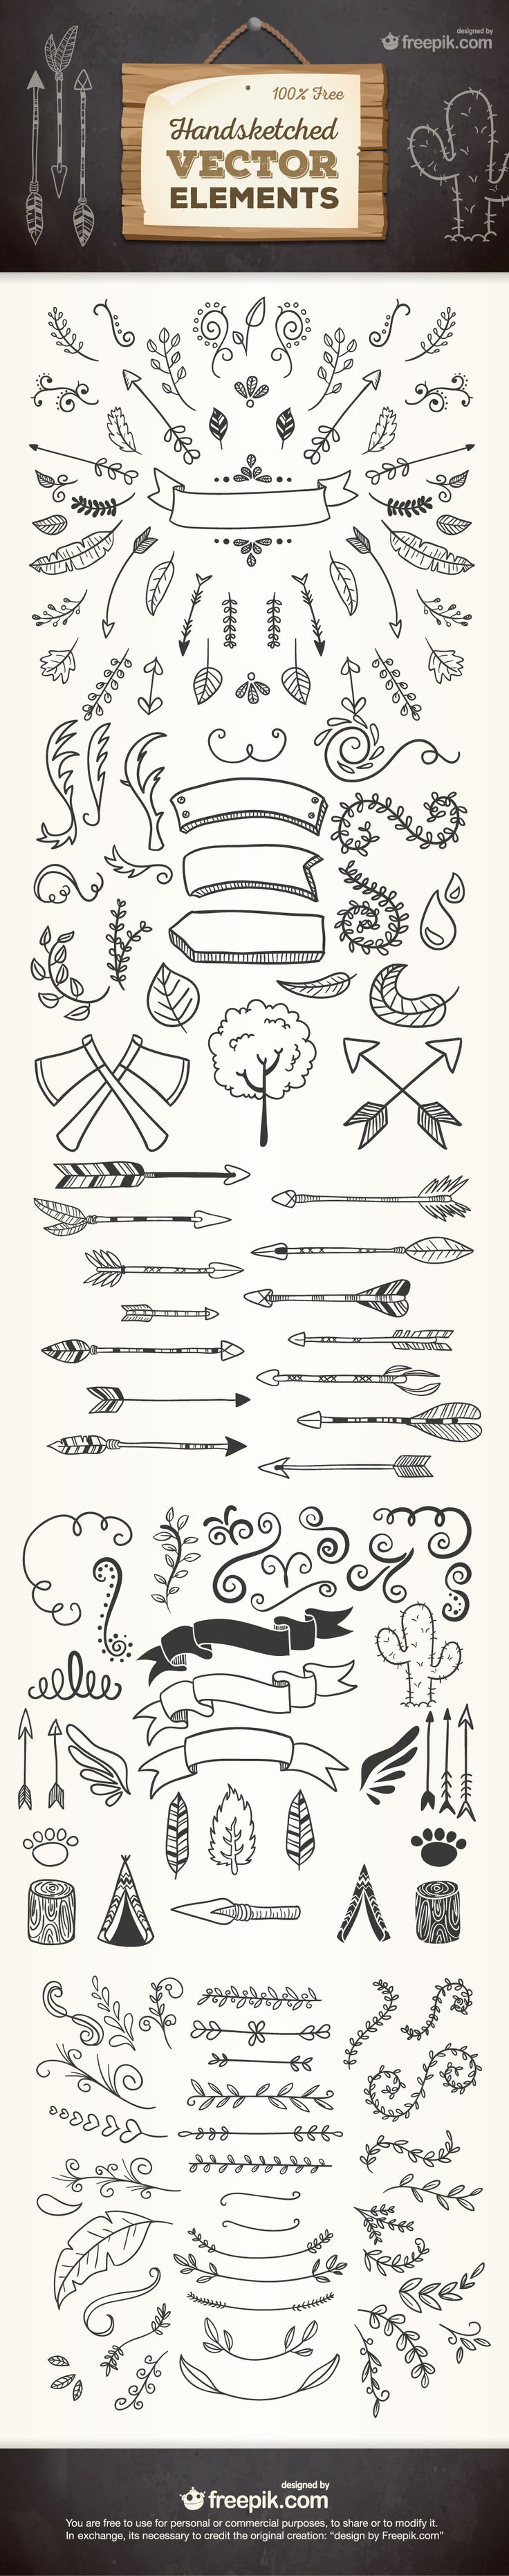 best calendar images on pinterest doodles bullet journal and